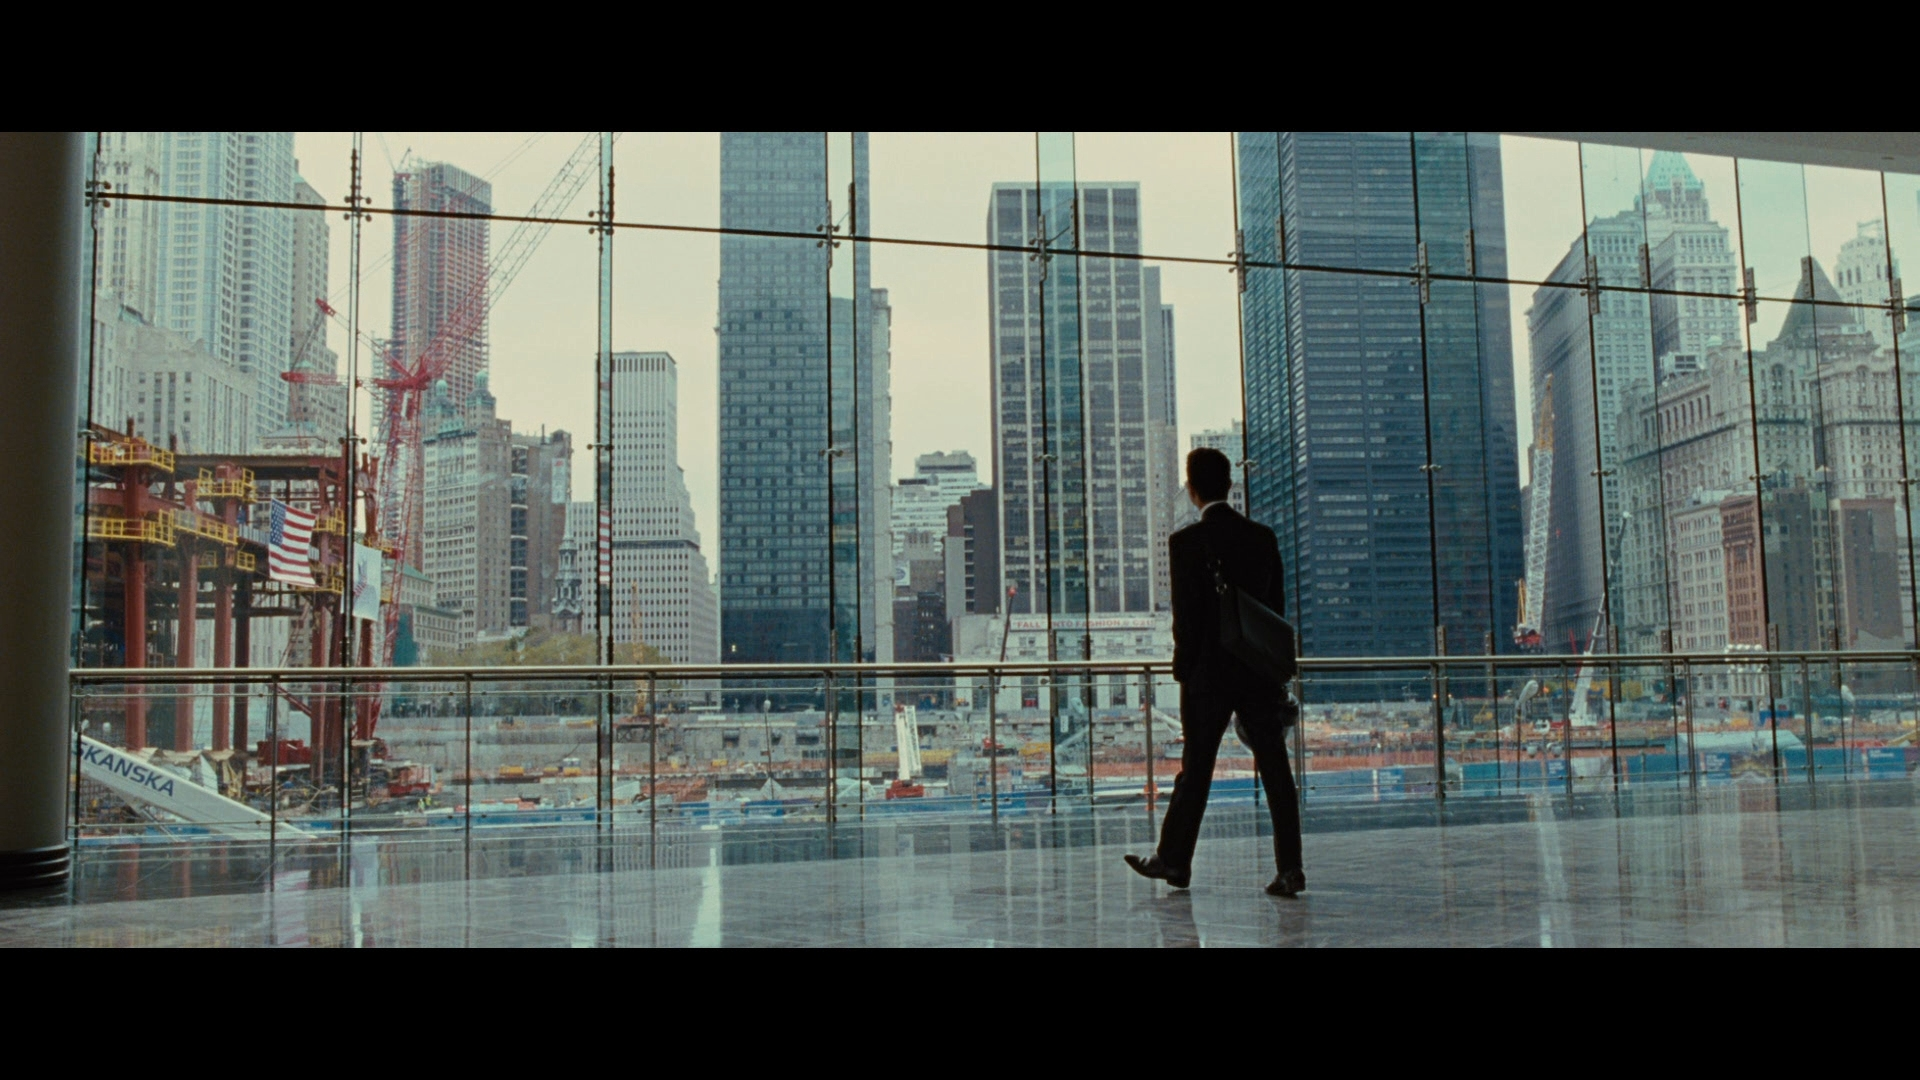 Wall Street Wallpaper - WallpaperSafari